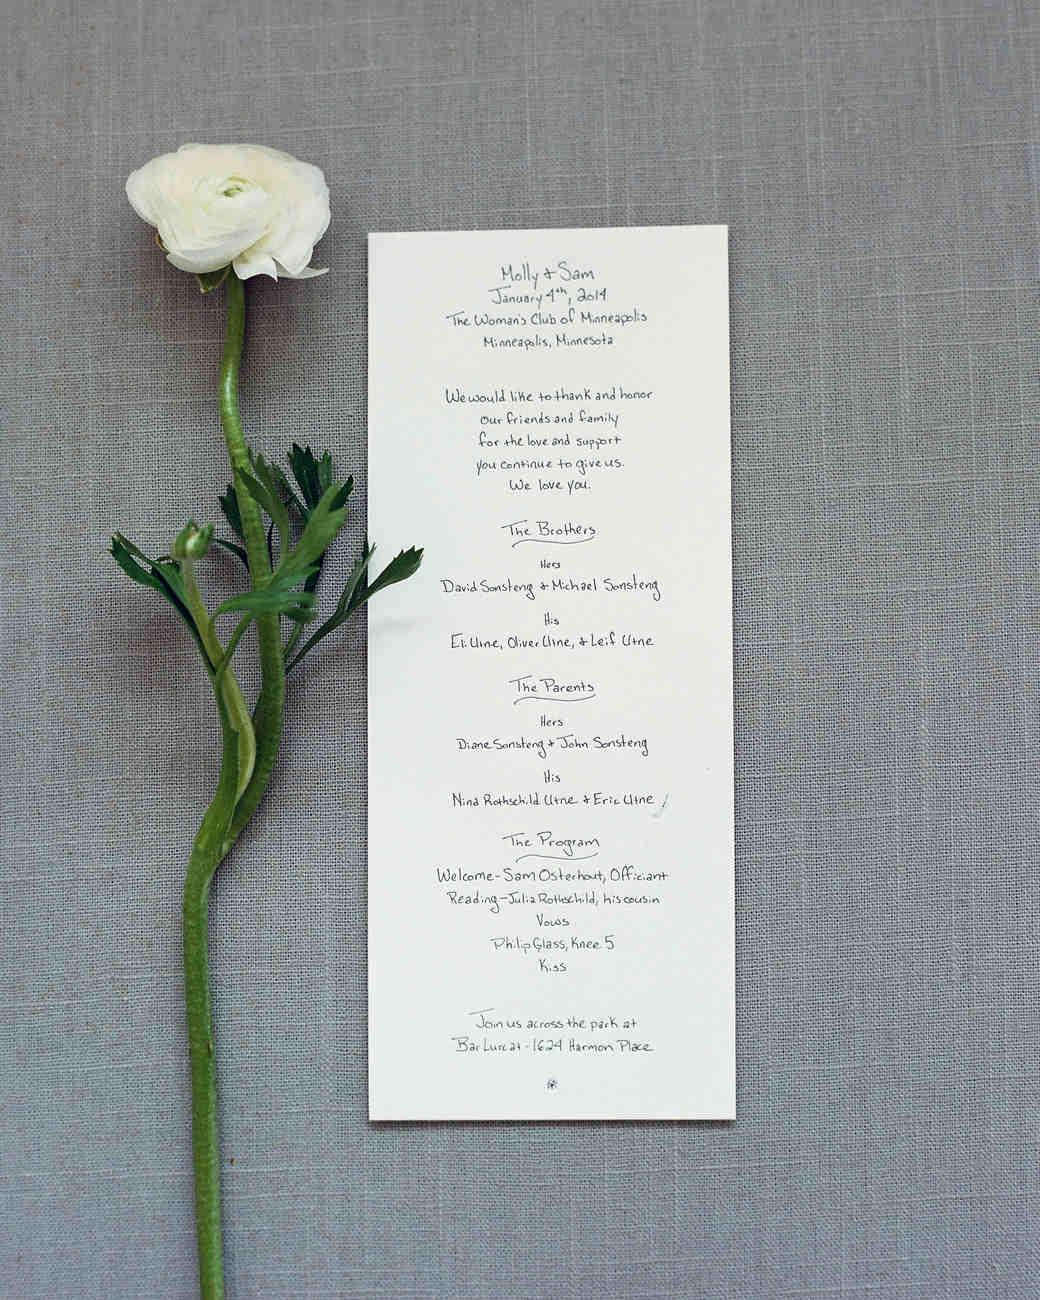 molly-sam-wedding-program-0614.jpg